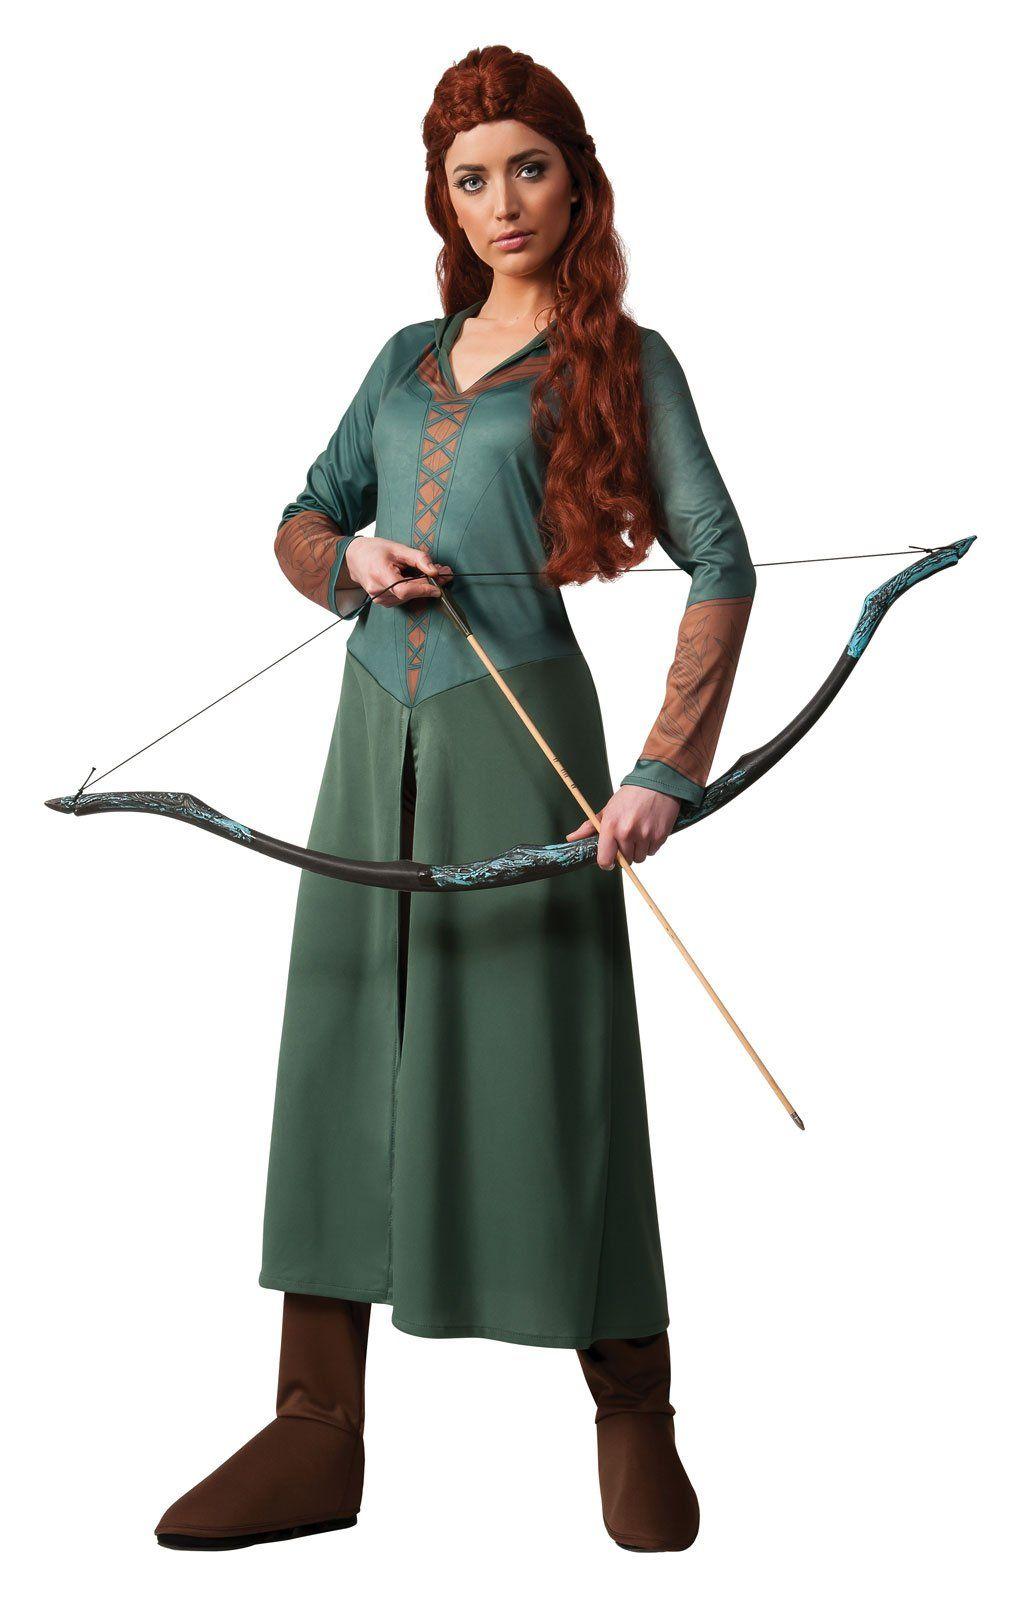 The Hobbit 2: Desolation of Smaug - Tauriel Elf Costume